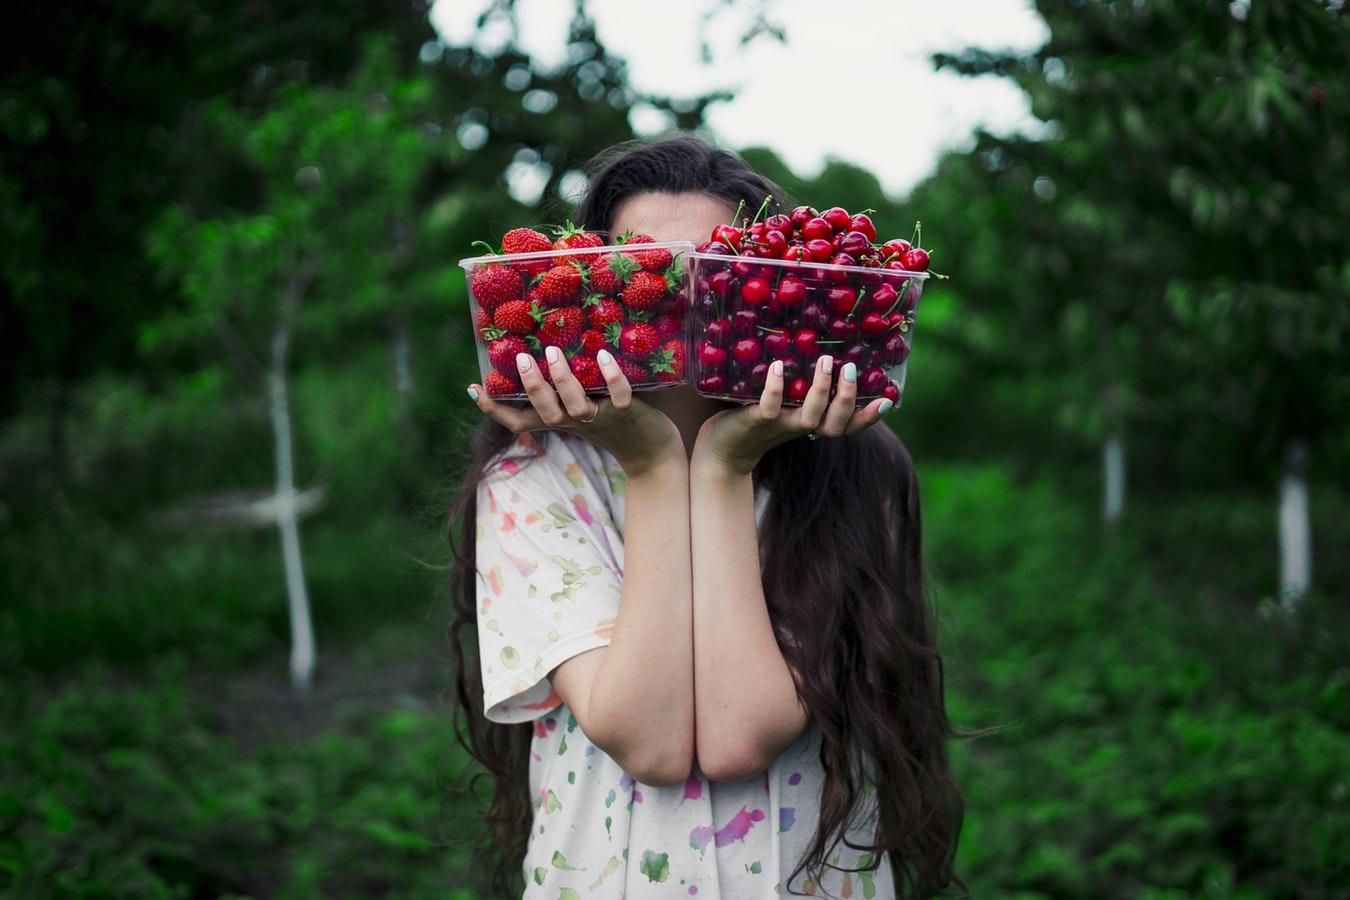 Dieta anticaldo: l'alimentazione corretta d'estate